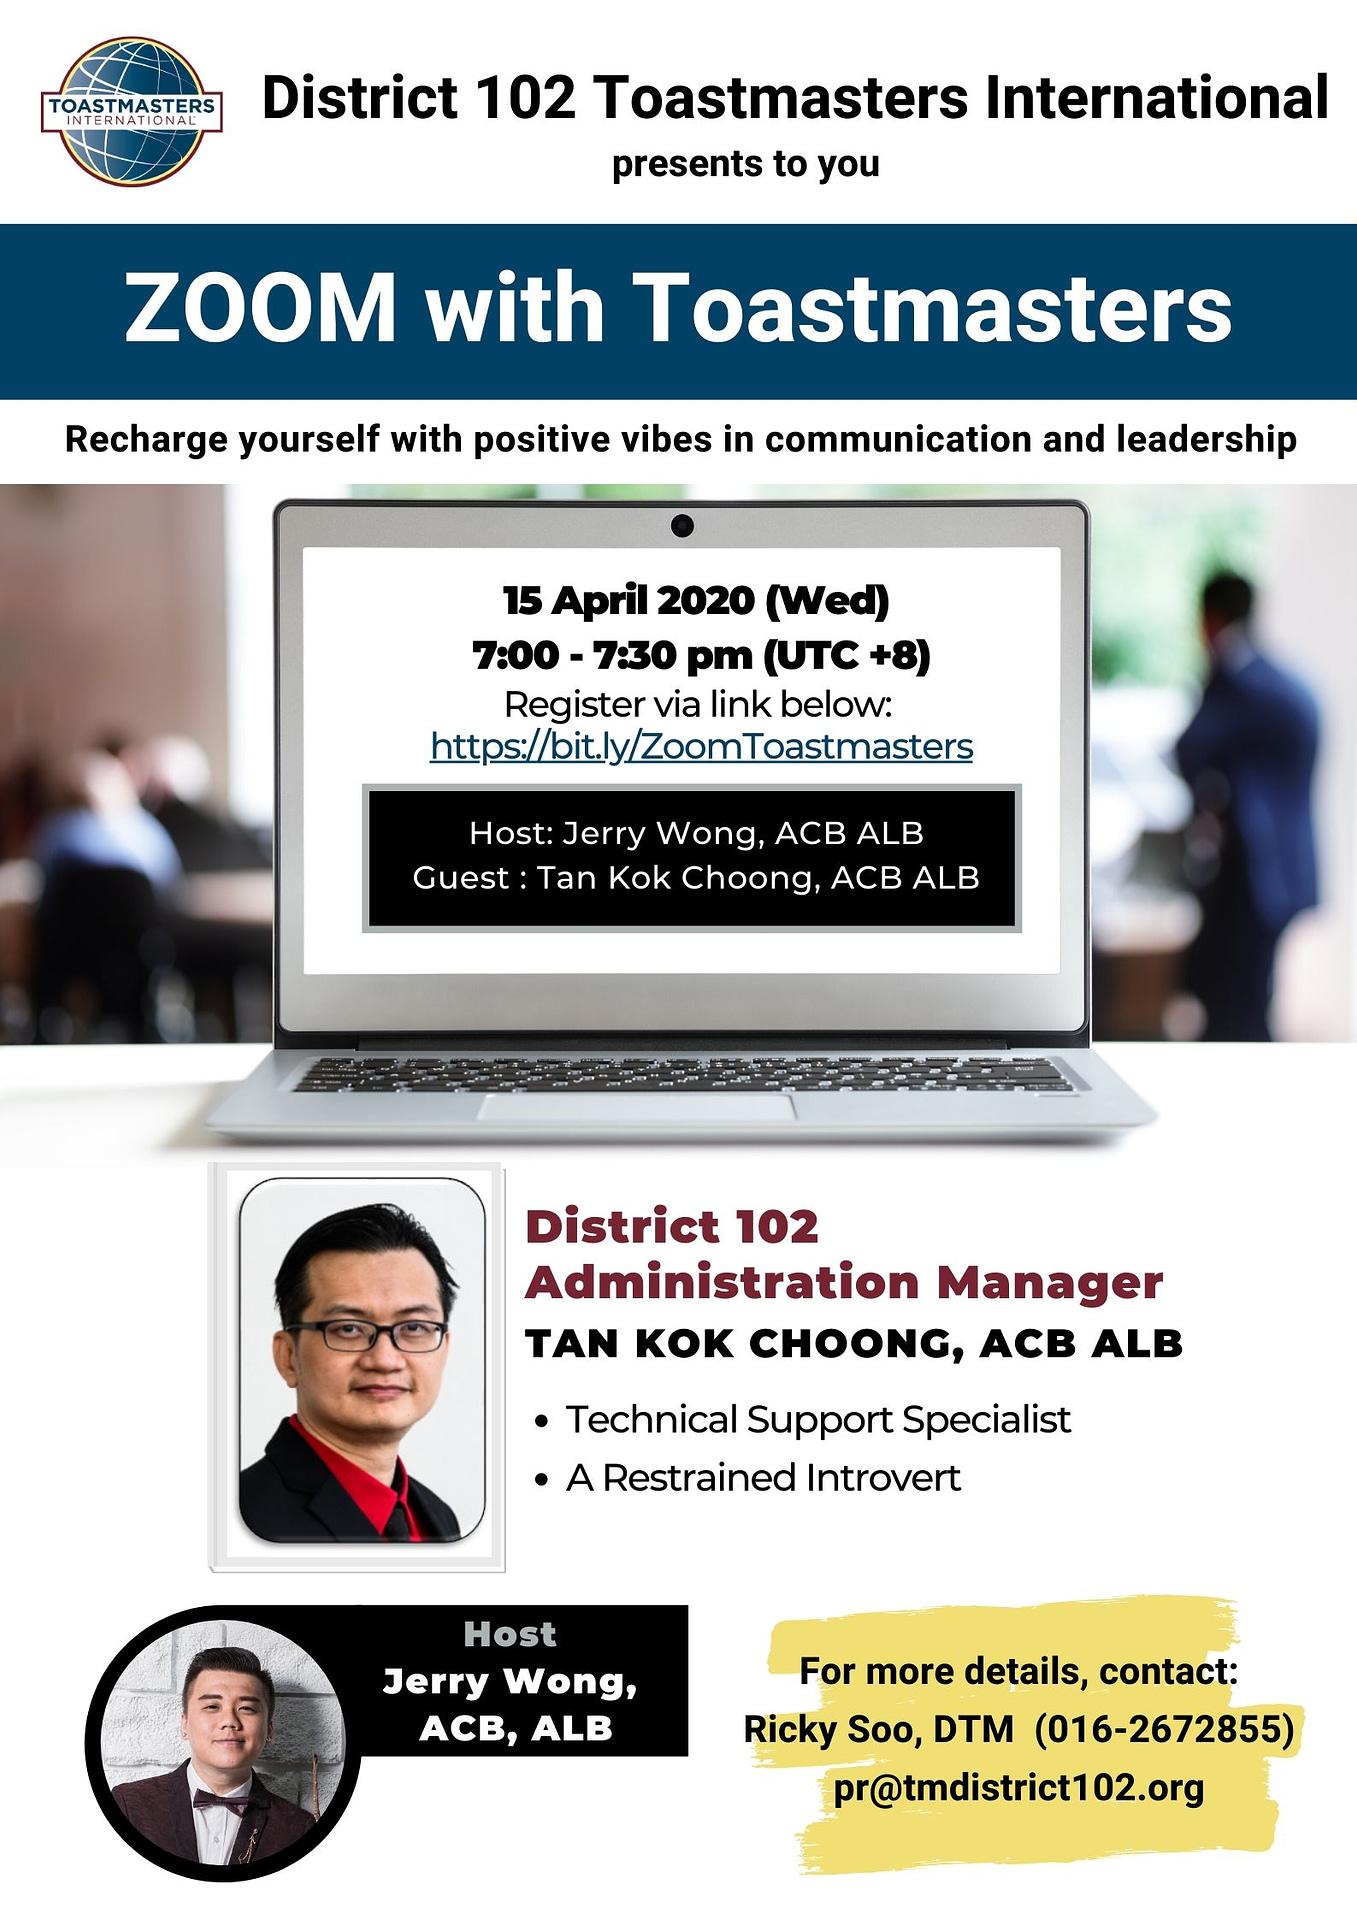 Zoom With Toastmasters Tan Kok Choong Acb Alb Toastmasters